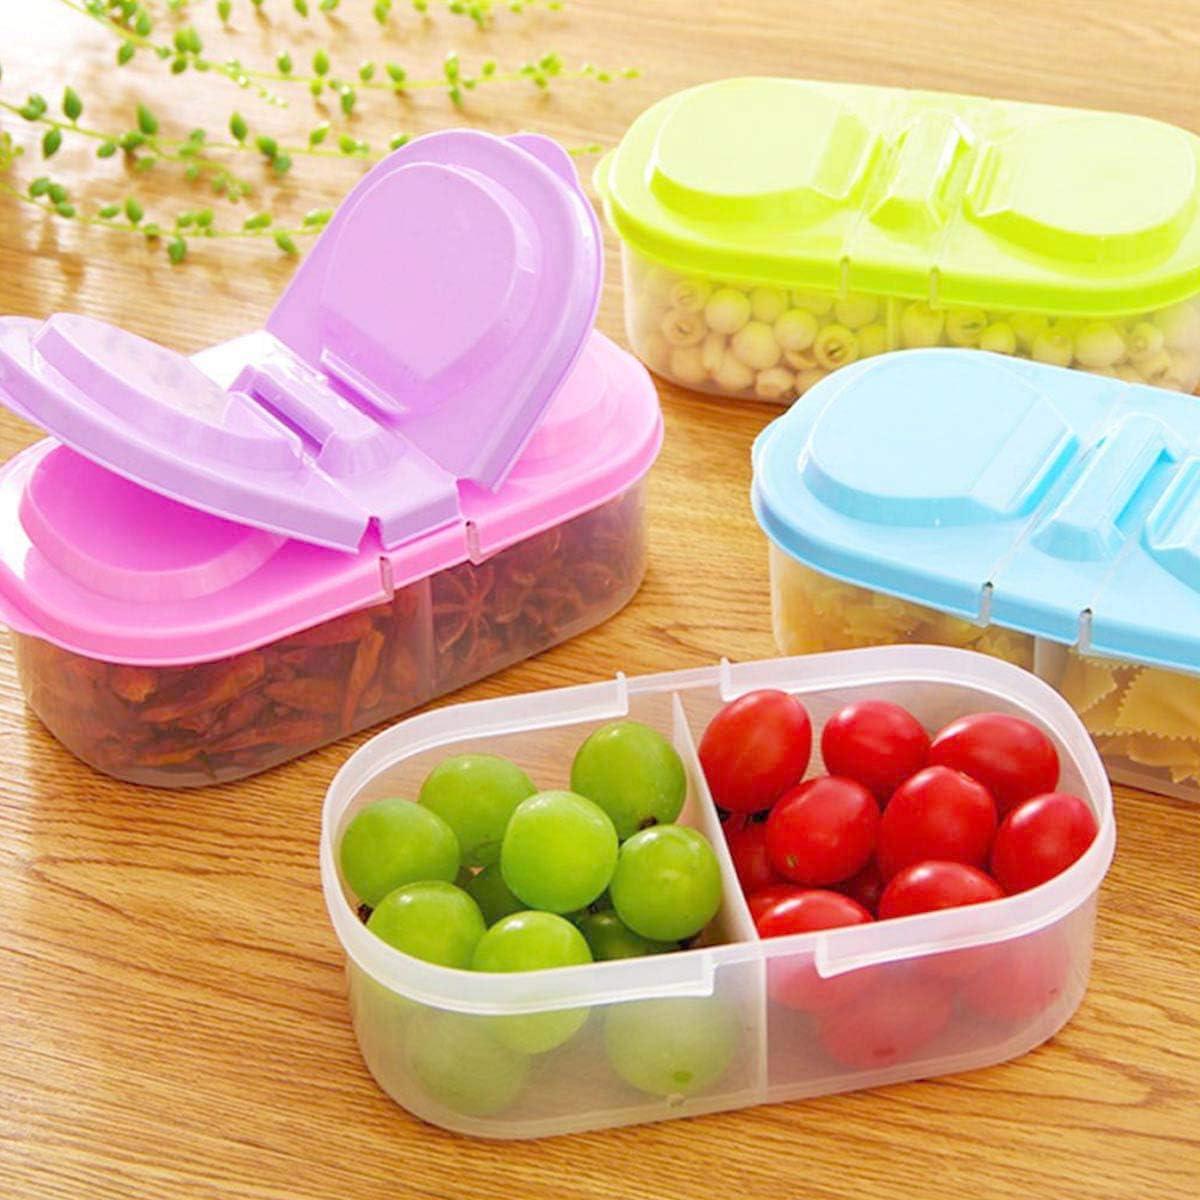 4pcs 2 Grid Reusable Plastic Food Storage Containers with Lids,Refrigerator Crisper Box Fresh Snacks Fruit Storage Box (Random Color)